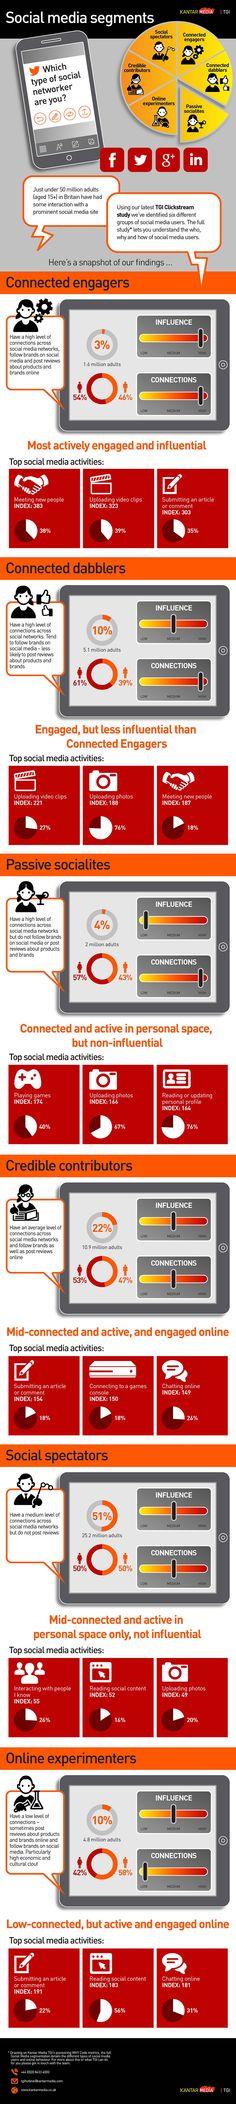 Social media segmentation infographic by Kantar Media TGI